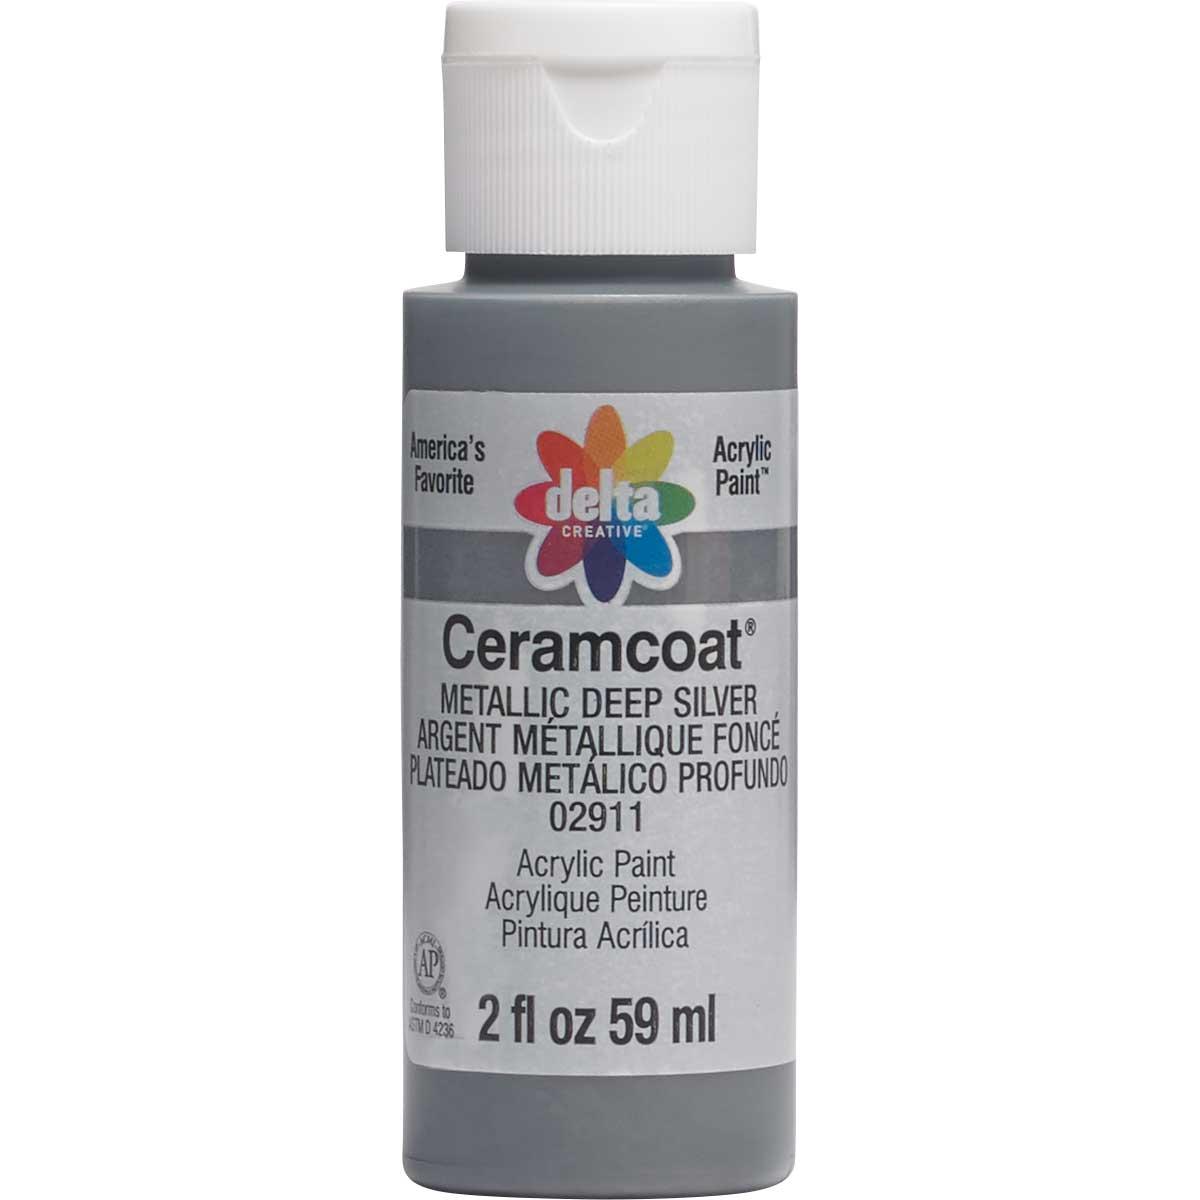 Delta Ceramcoat ® Acrylic Paint - Metallic Deep Silver, 2 oz. - 02911